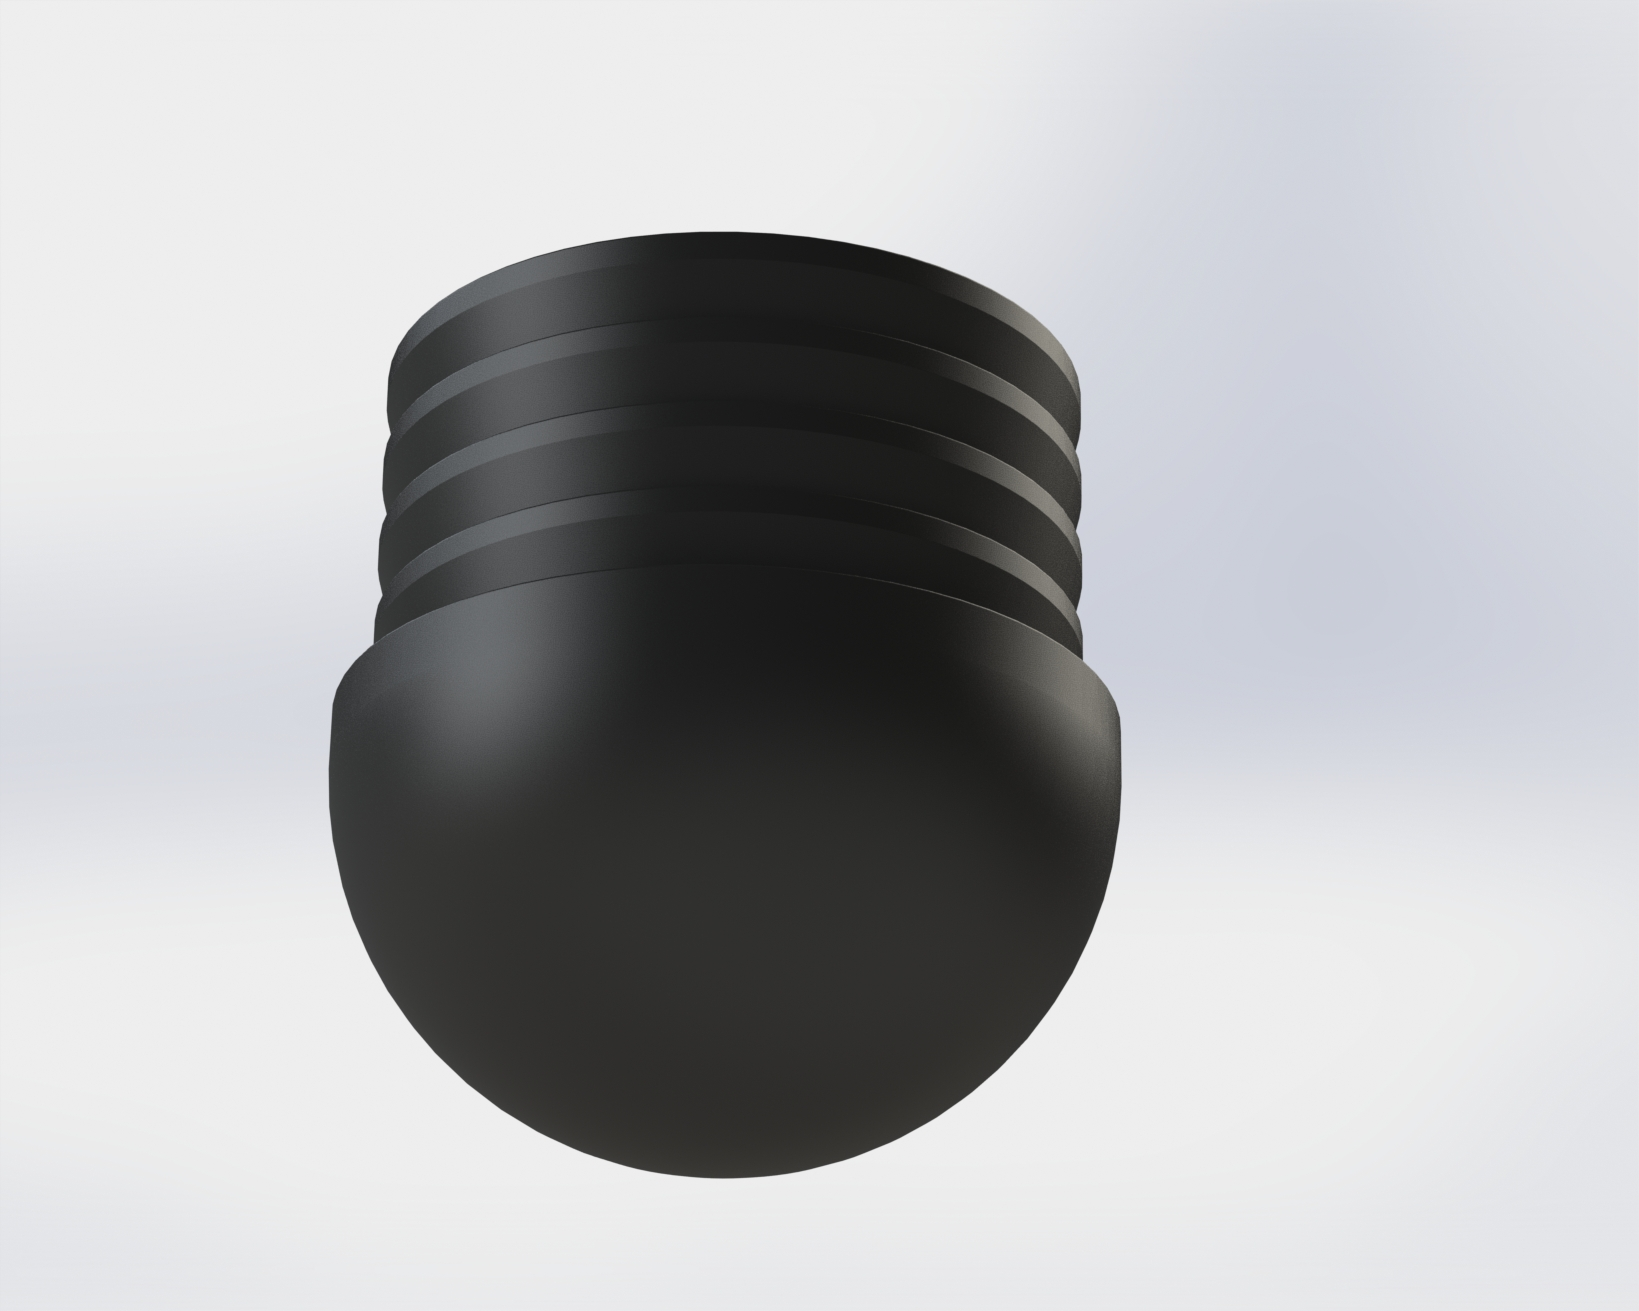 Tapones macizos IPV para tubería metálica